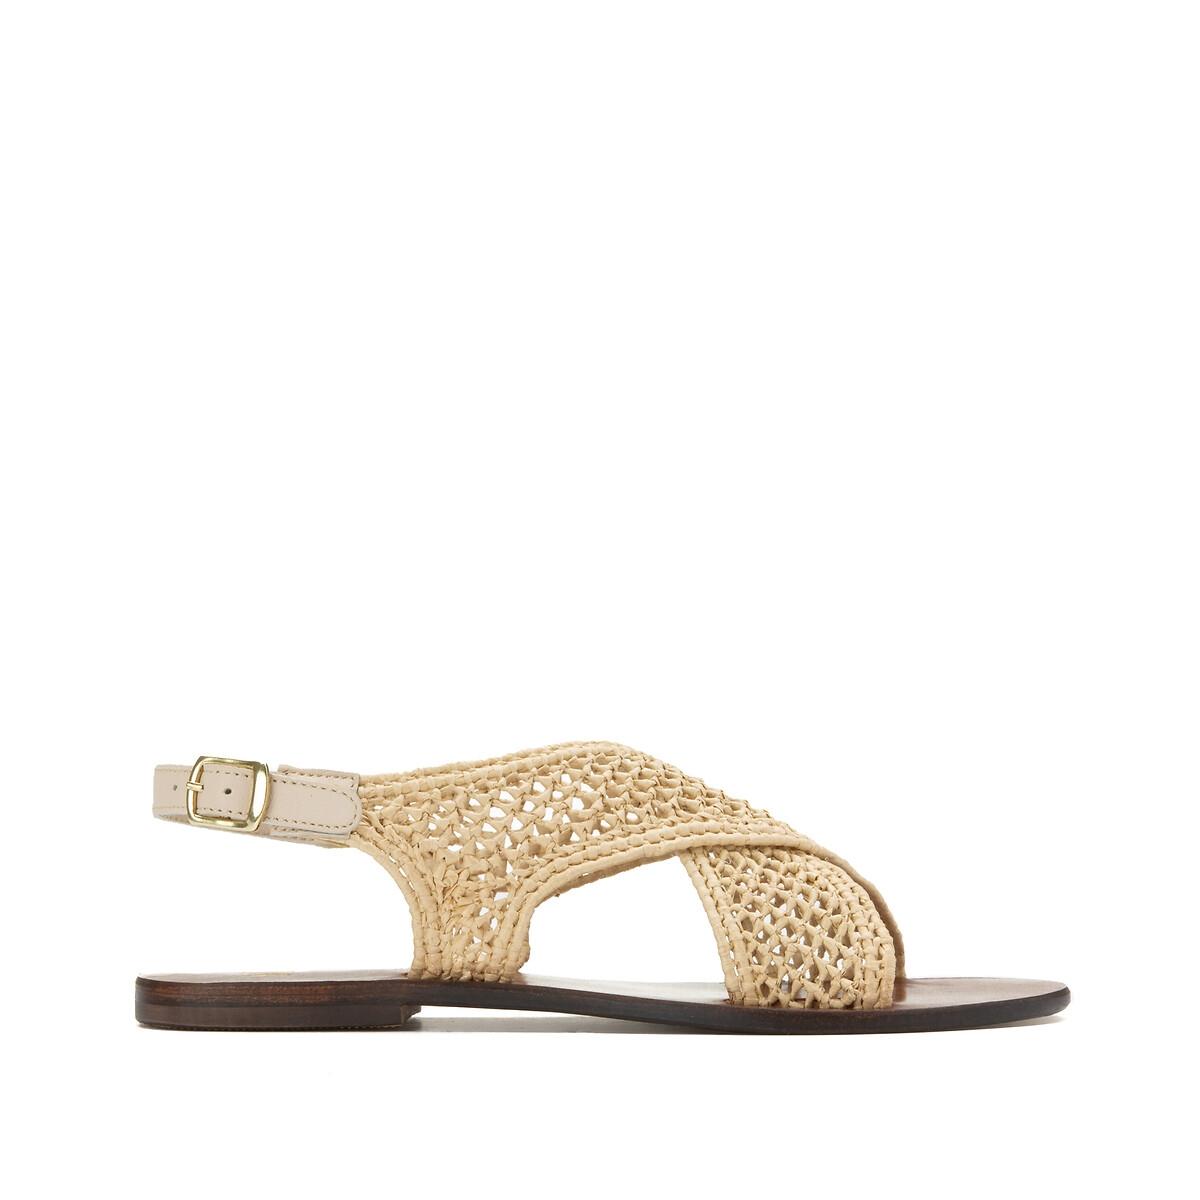 Sandalias caladas de rafia, con correas cruzadas